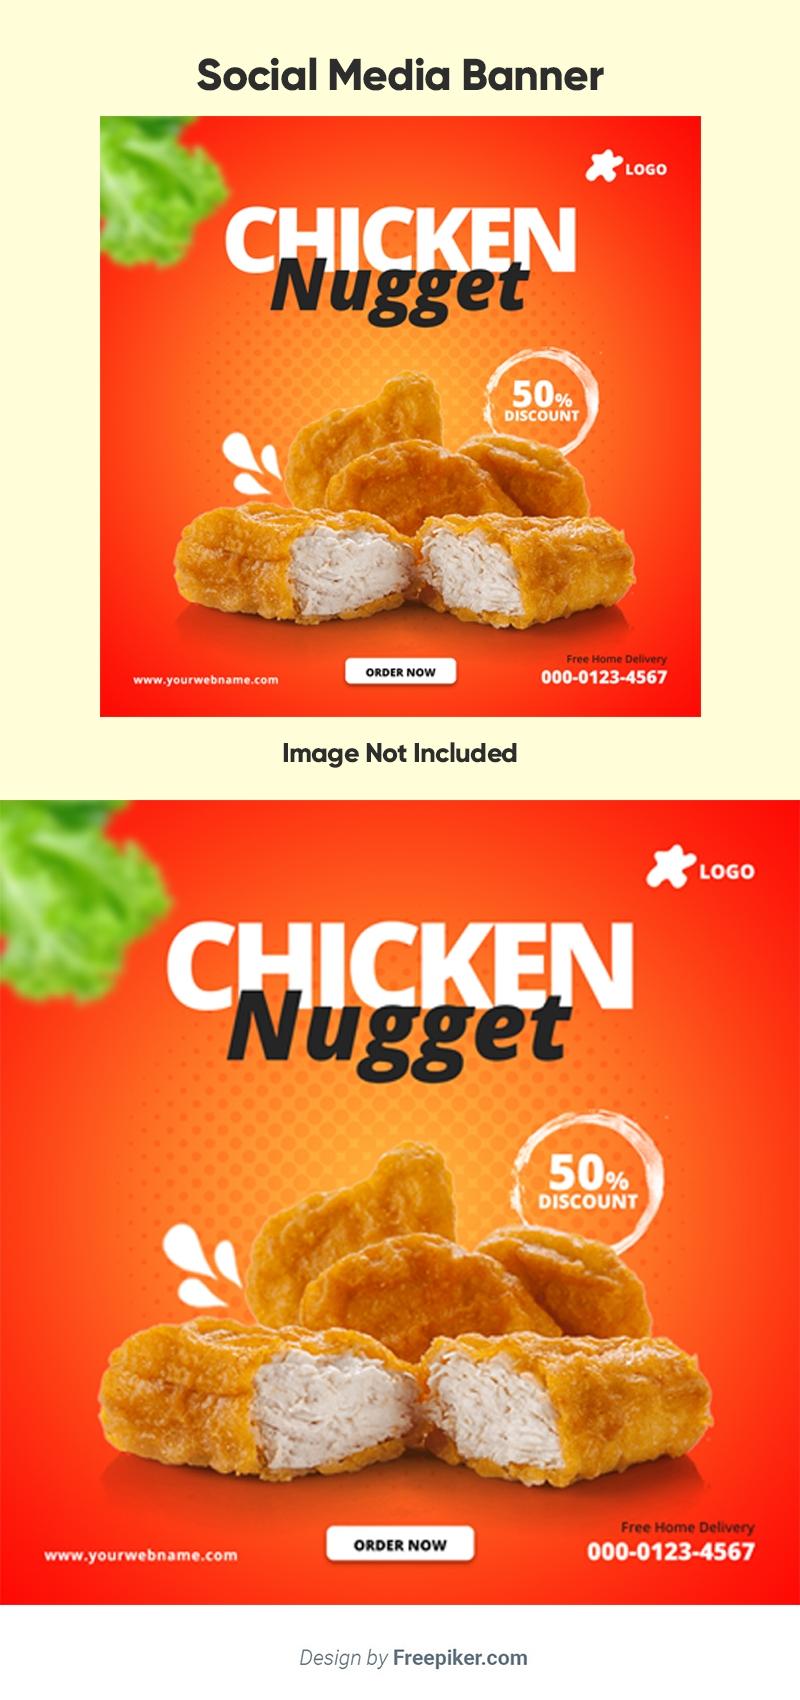 Chicken Nugget Social Media Banner Template